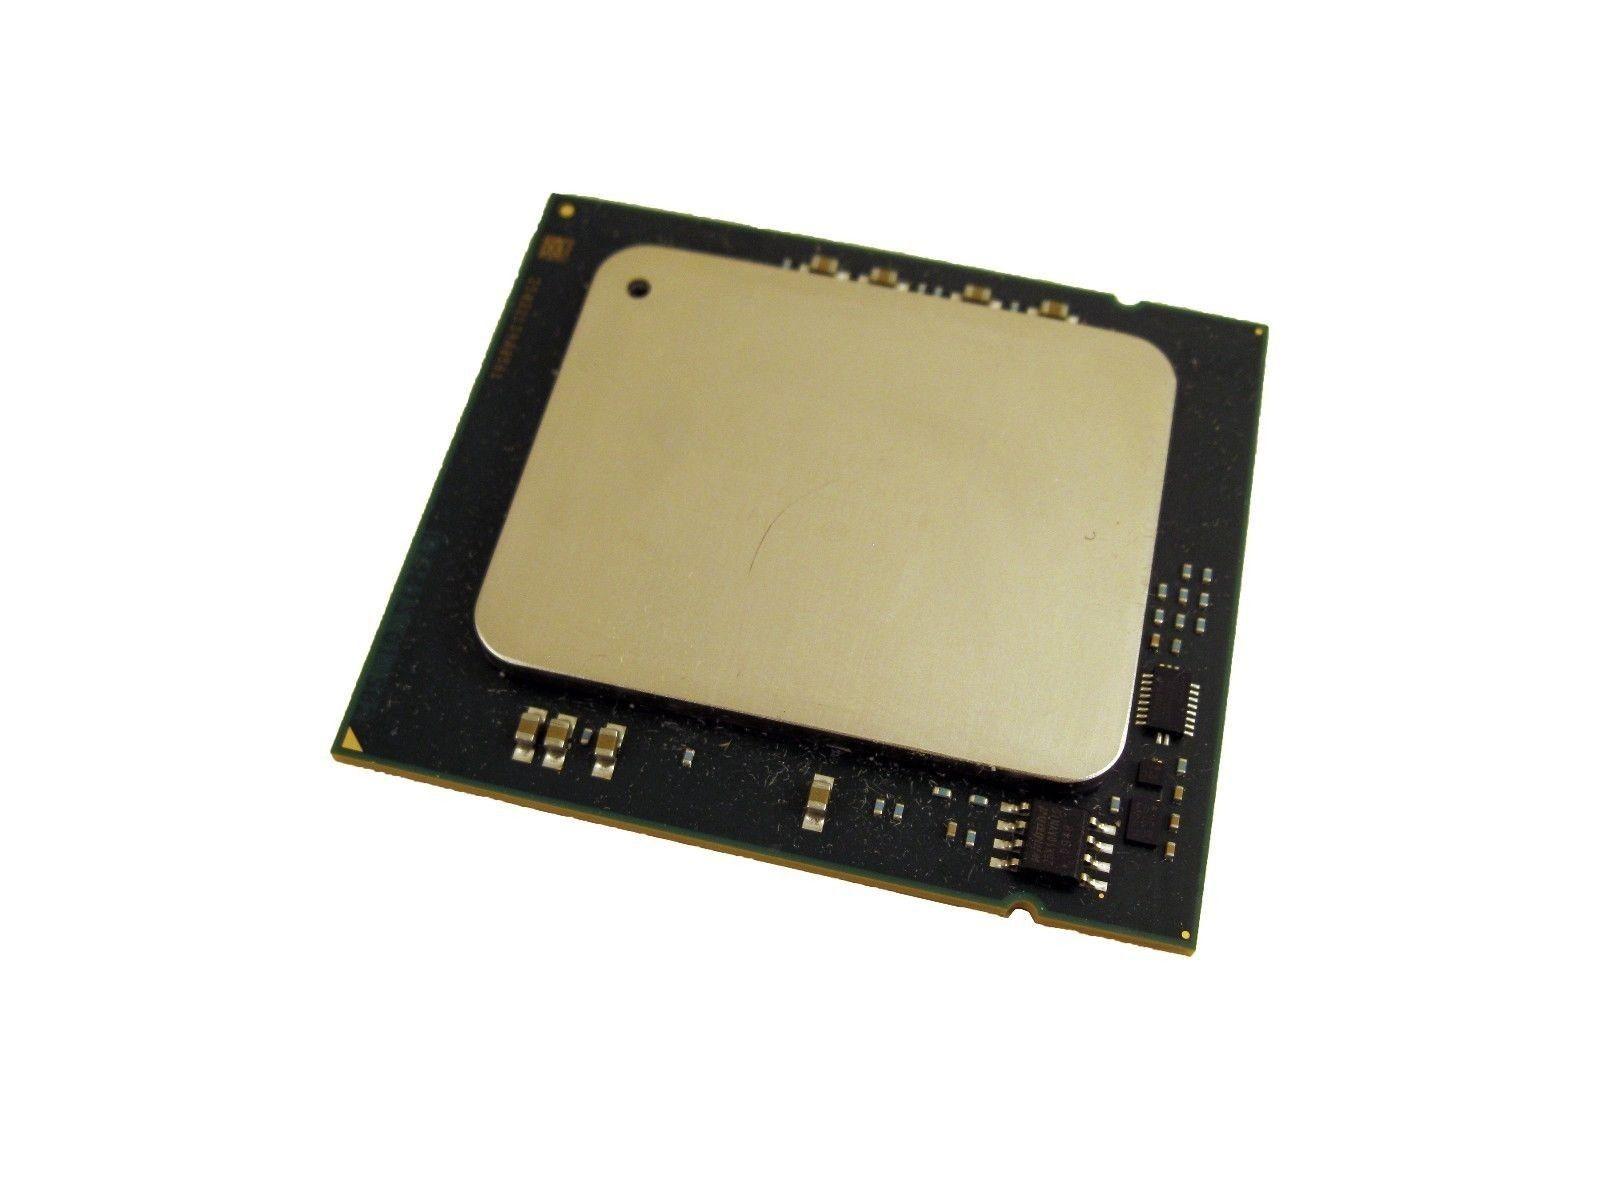 Intel SLBRD Xeon X7560 2.26GHz 8 Core 24MB LGA 1567 CPU Processor